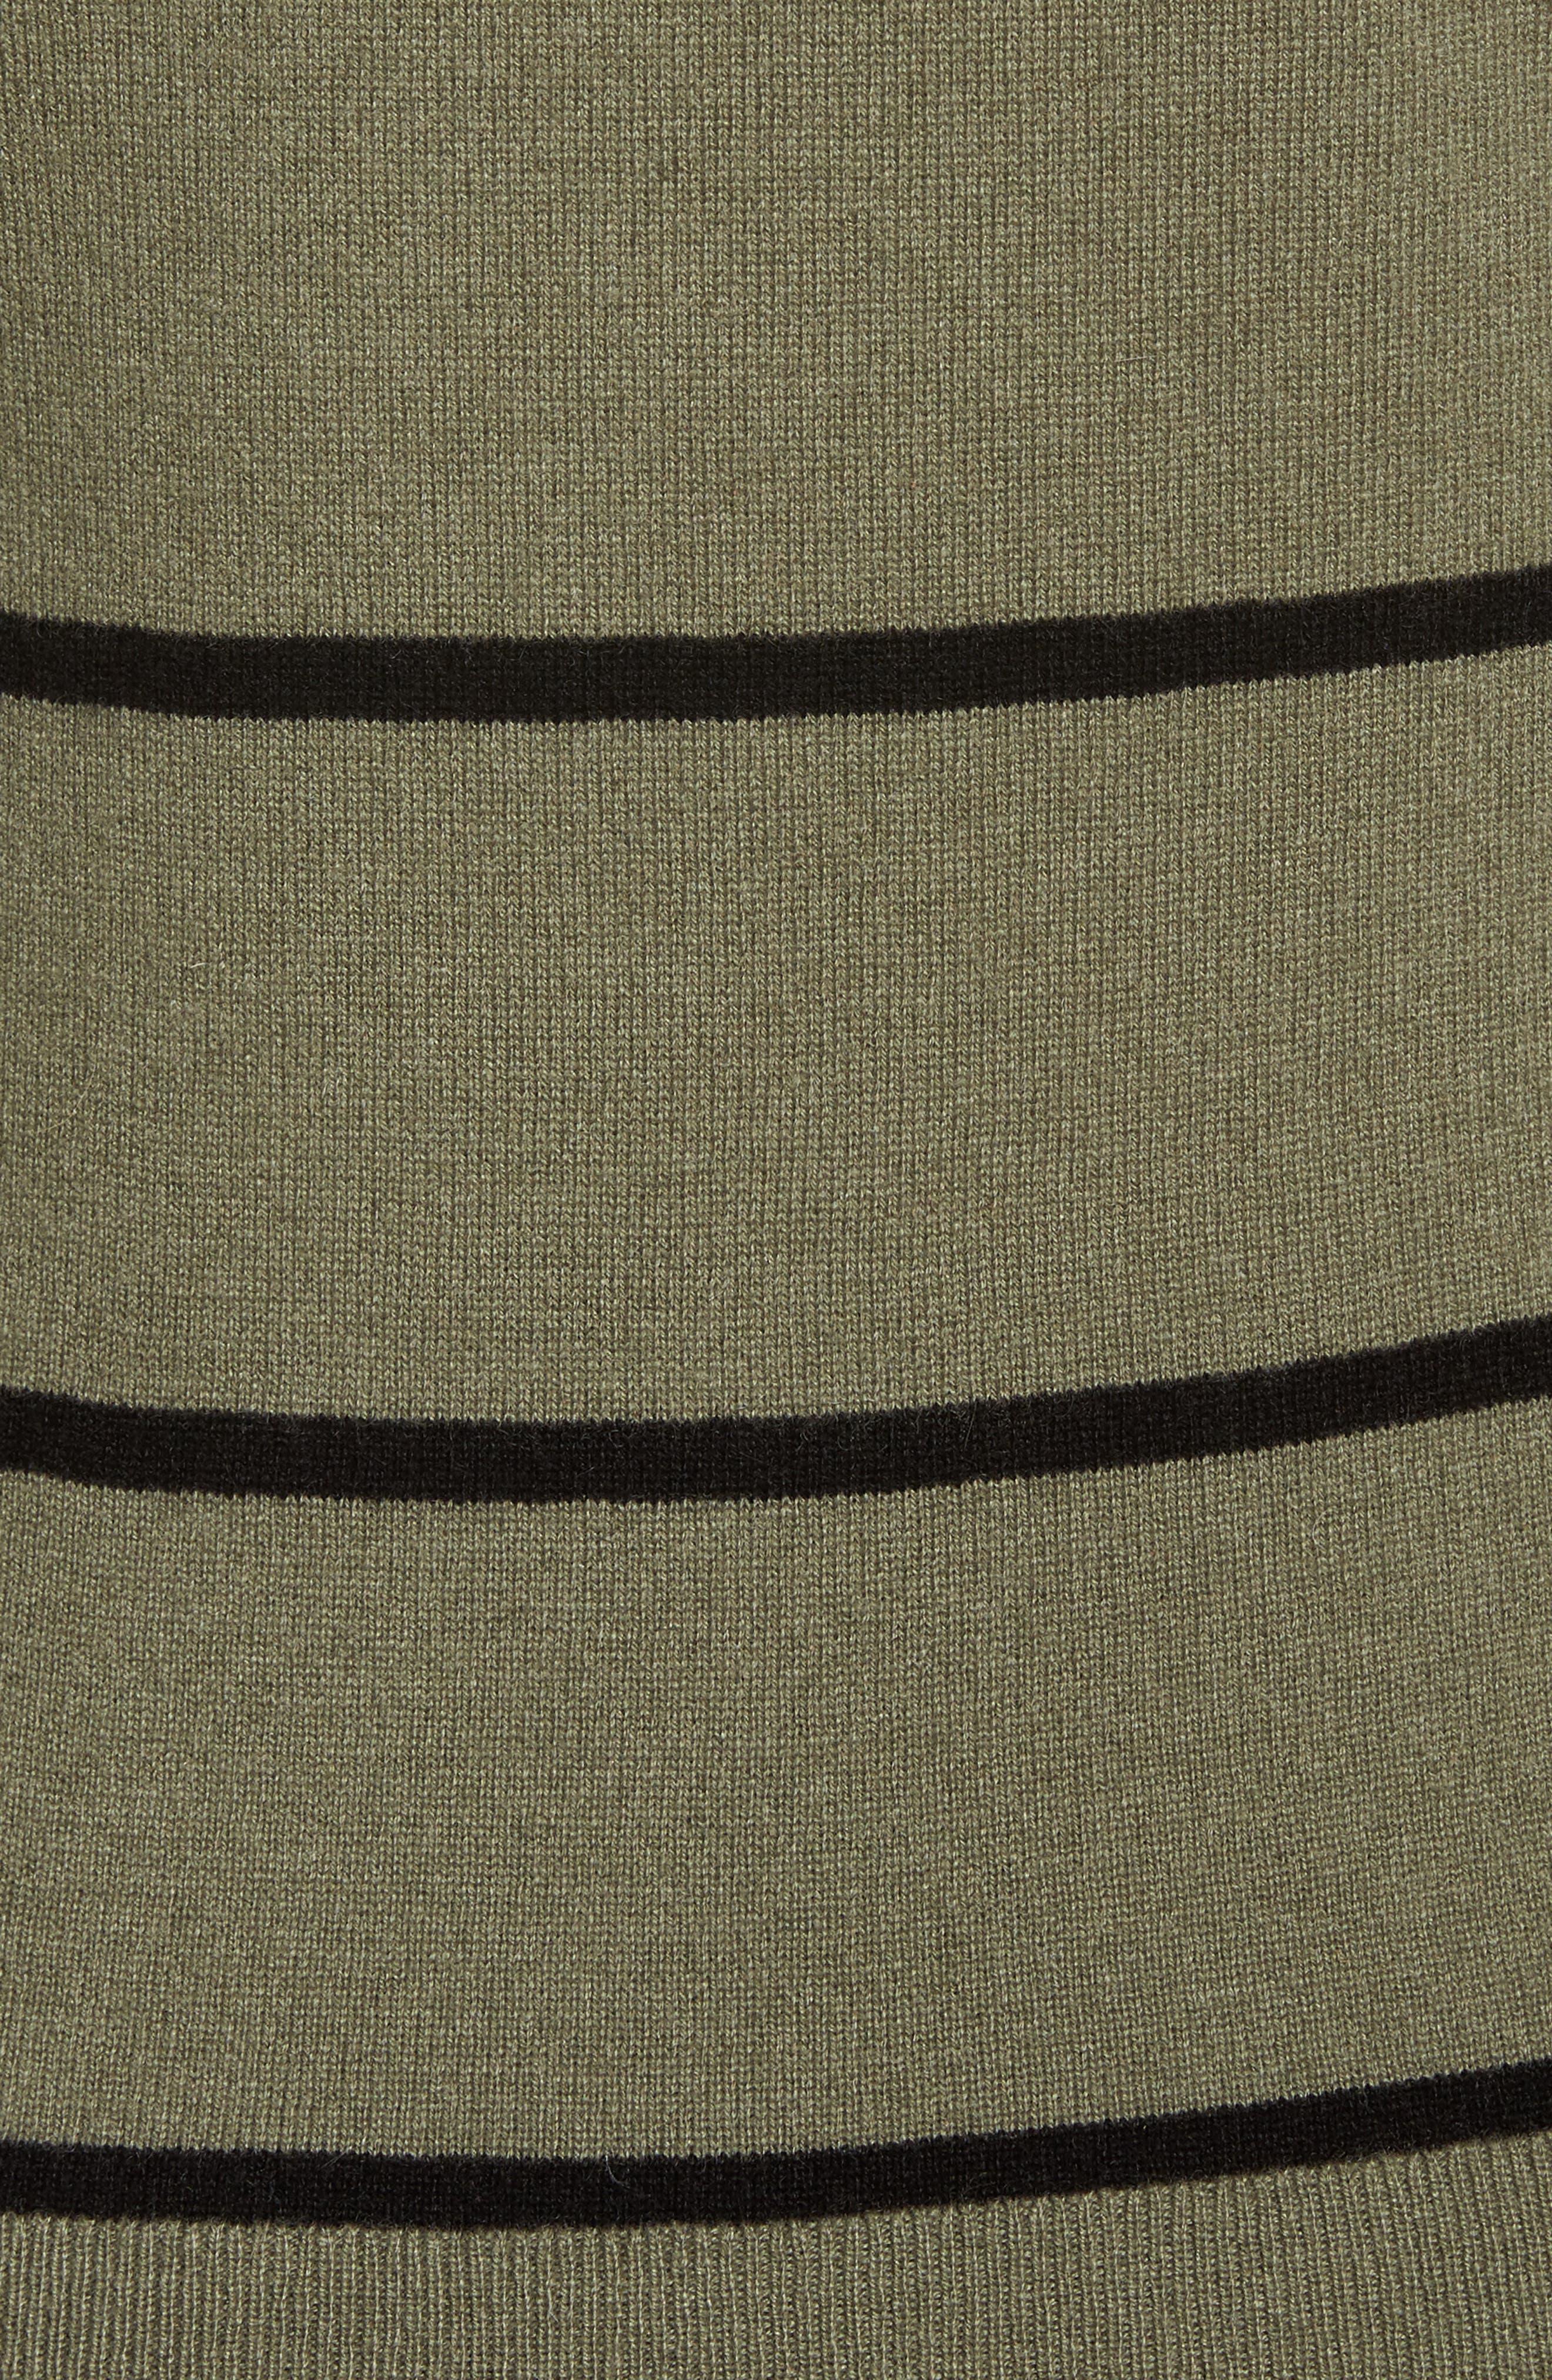 Stripe Cashmere Sweater,                             Alternate thumbnail 5, color,                             315